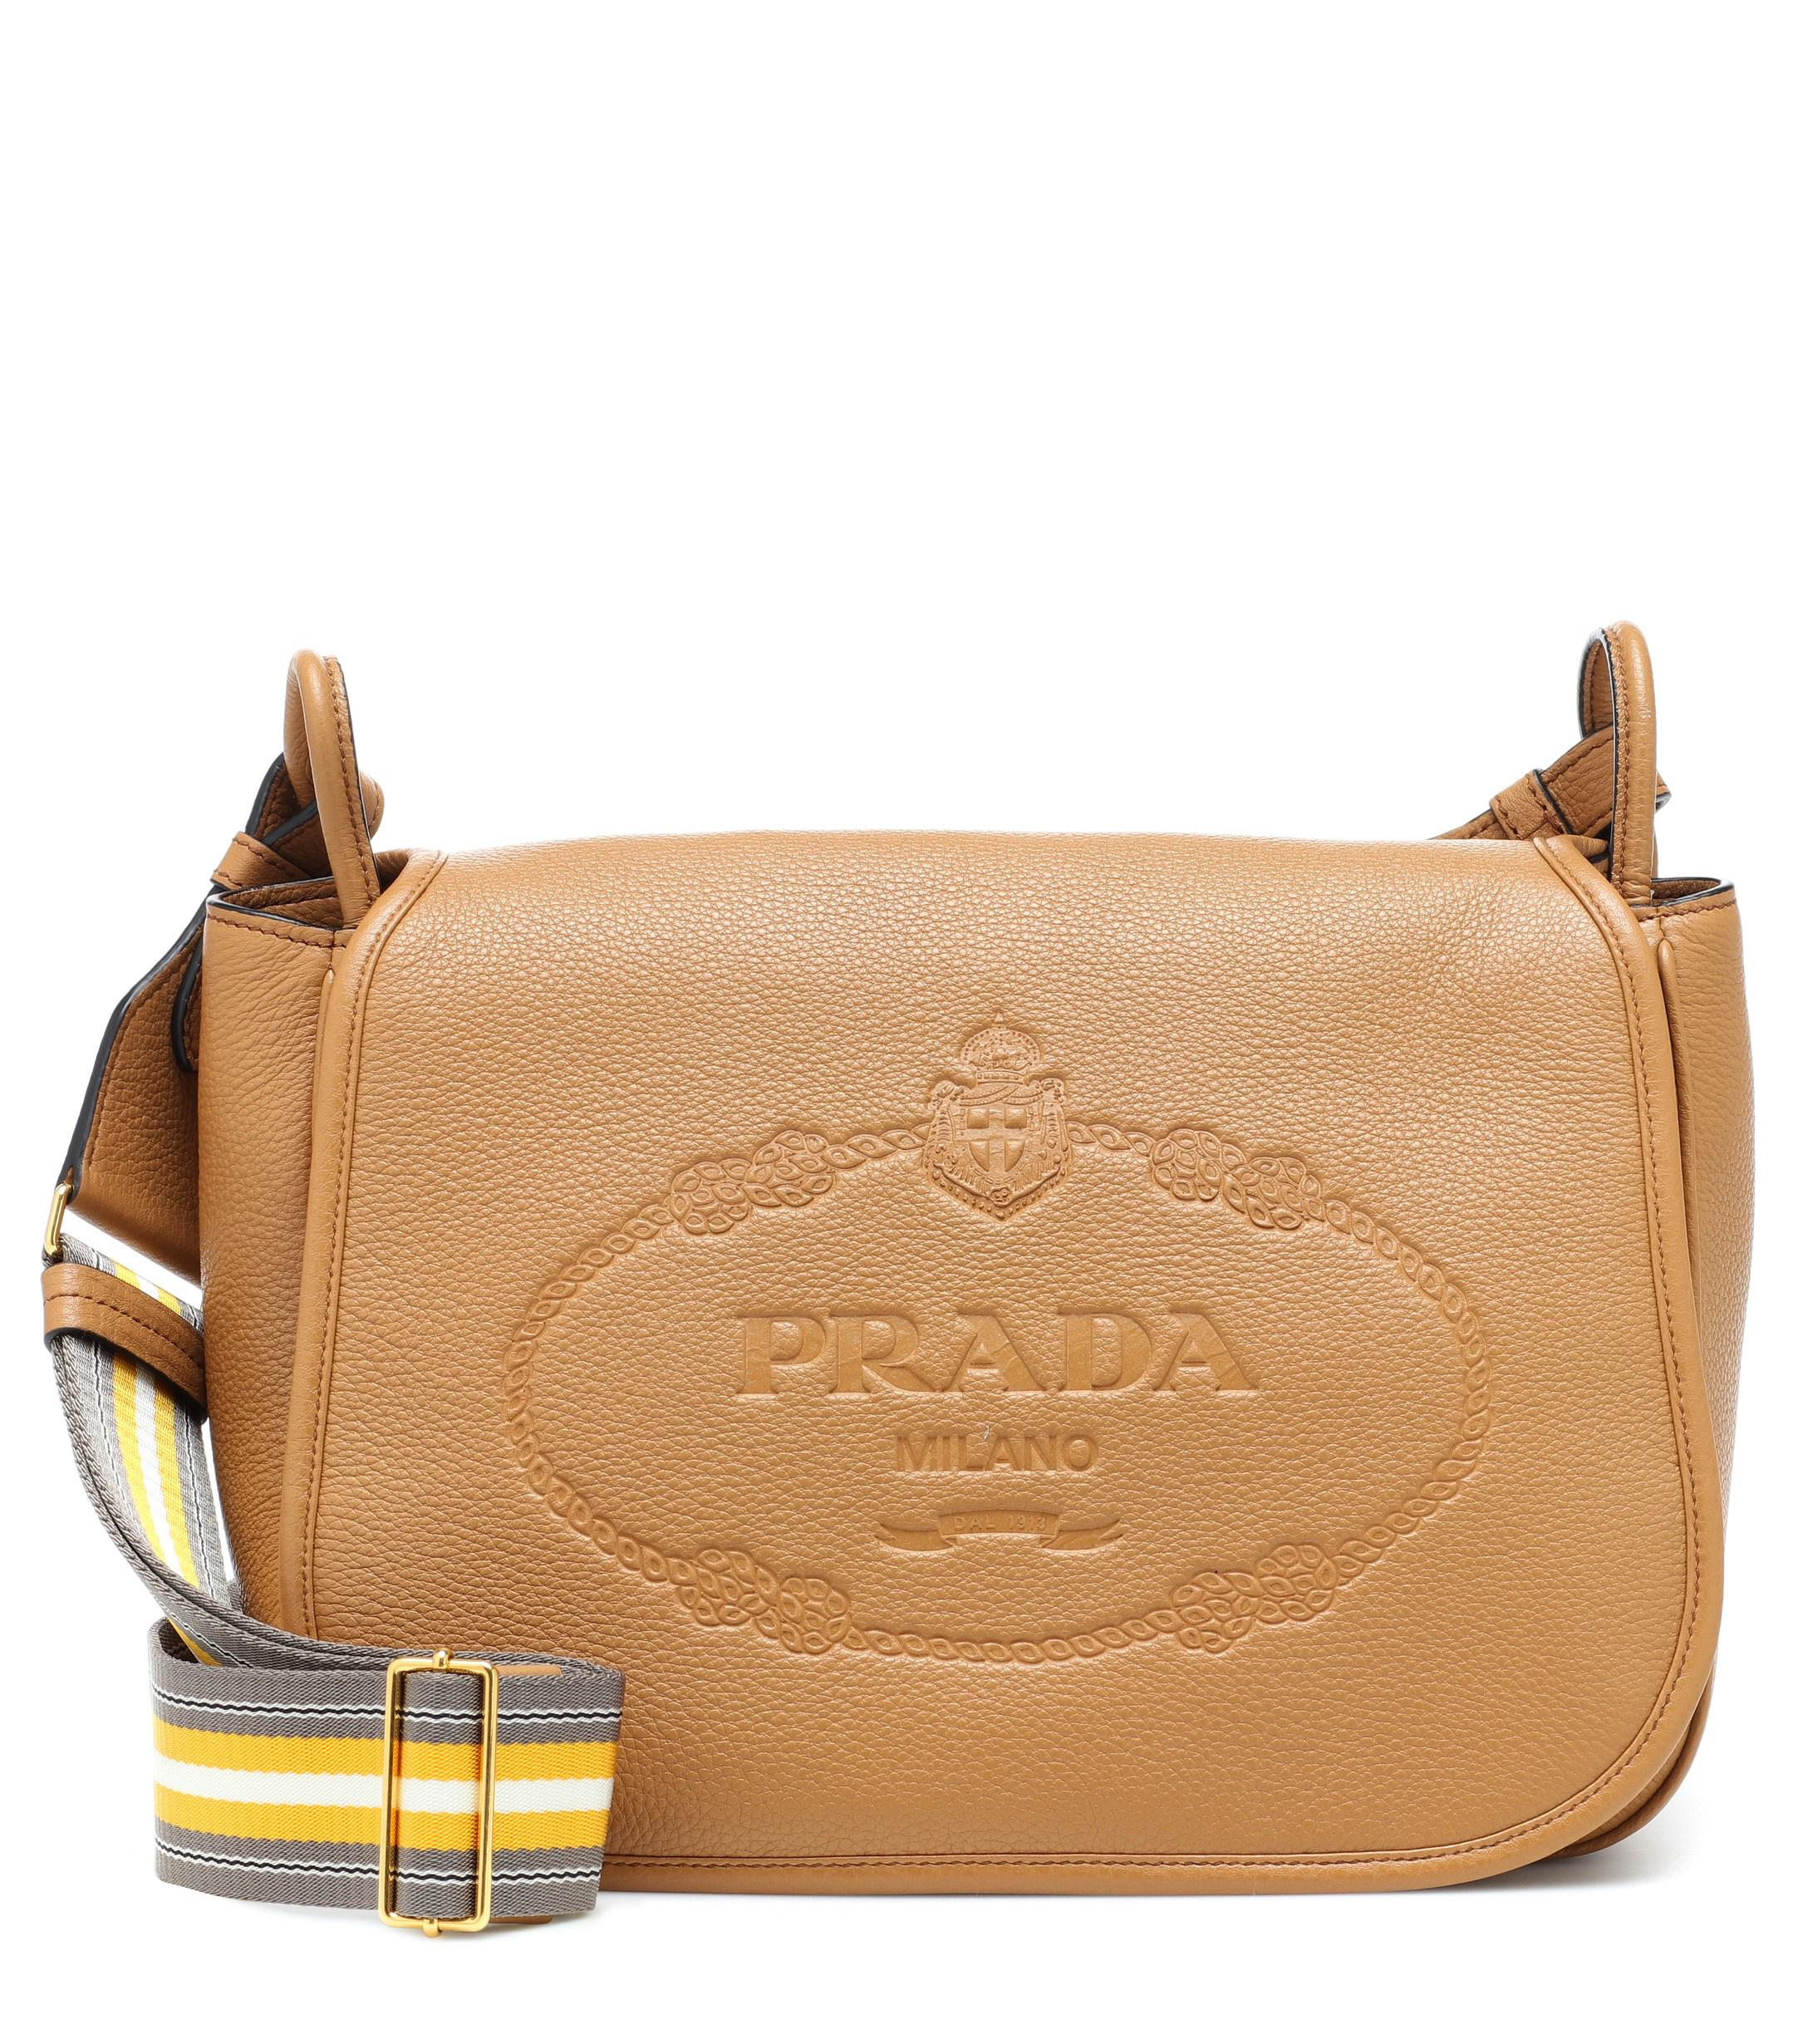 ce71c157d4 Prada. Women s Leather Shoulder Bag